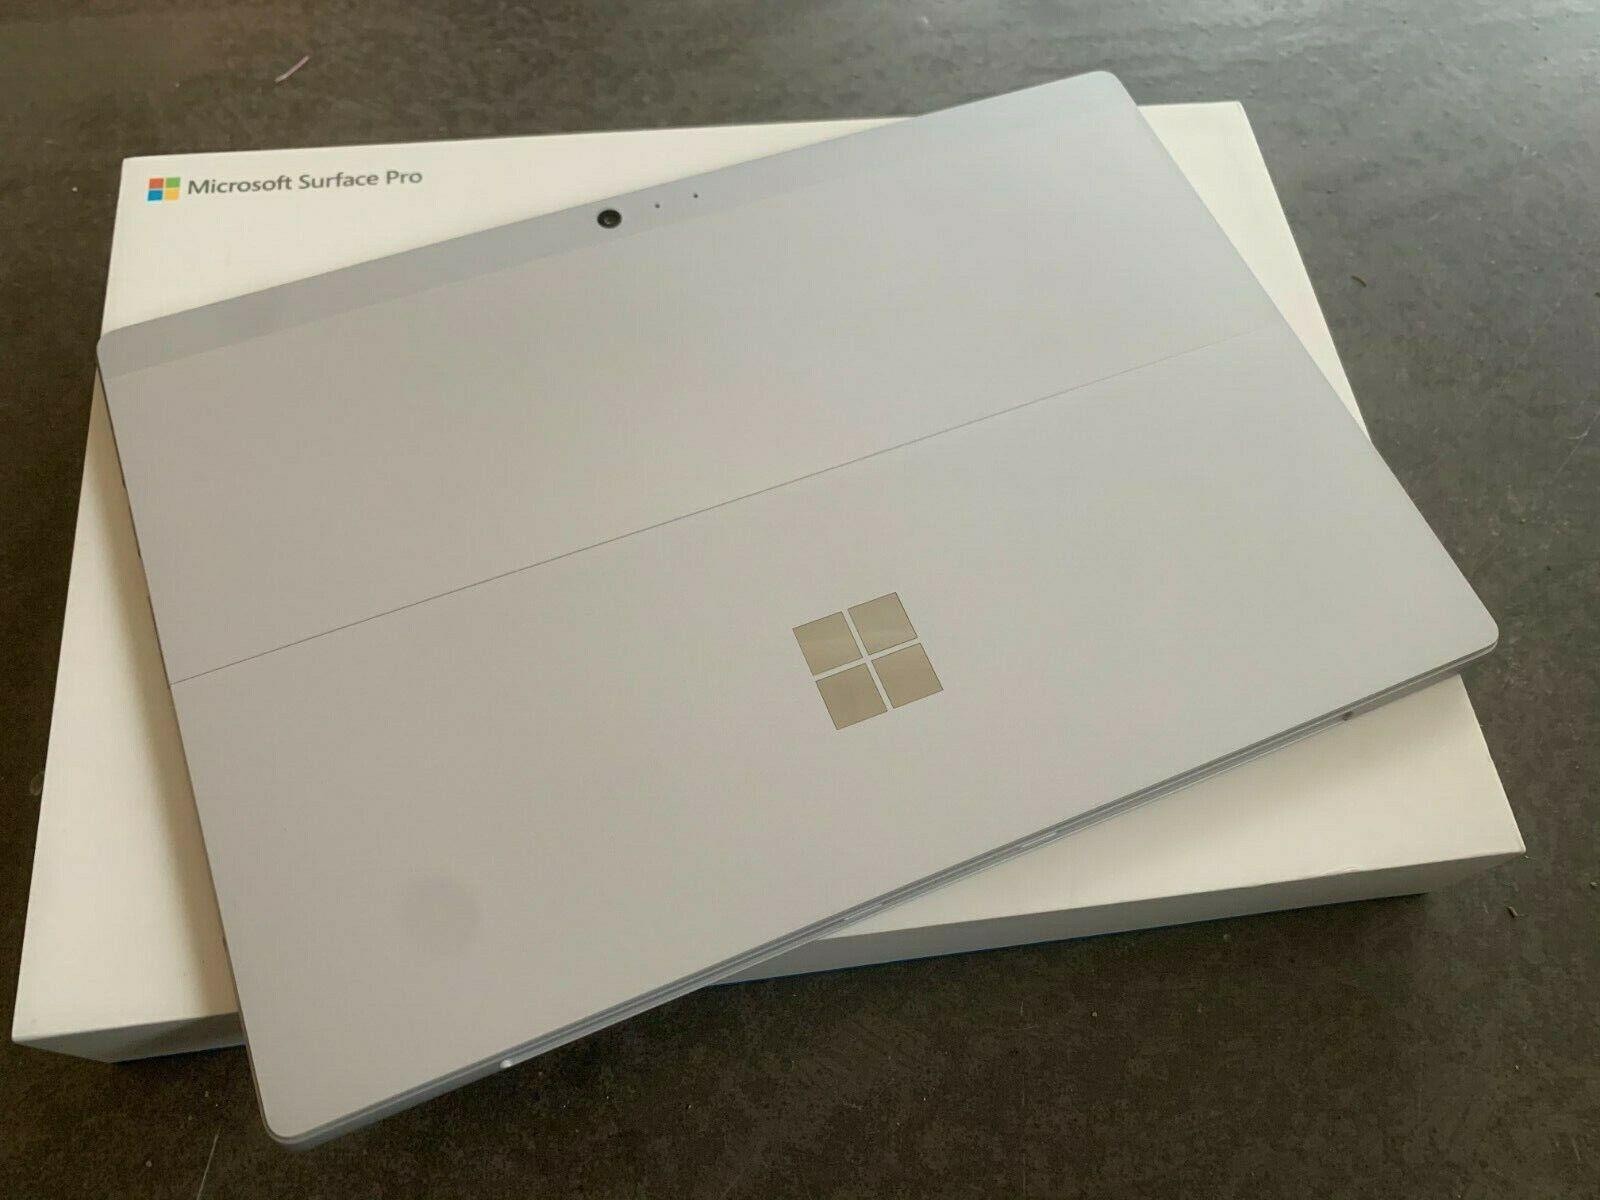 Microsoft surface pro 5 gen core i5 7300u 4gb ram 128gb ssd lte advanced win 10